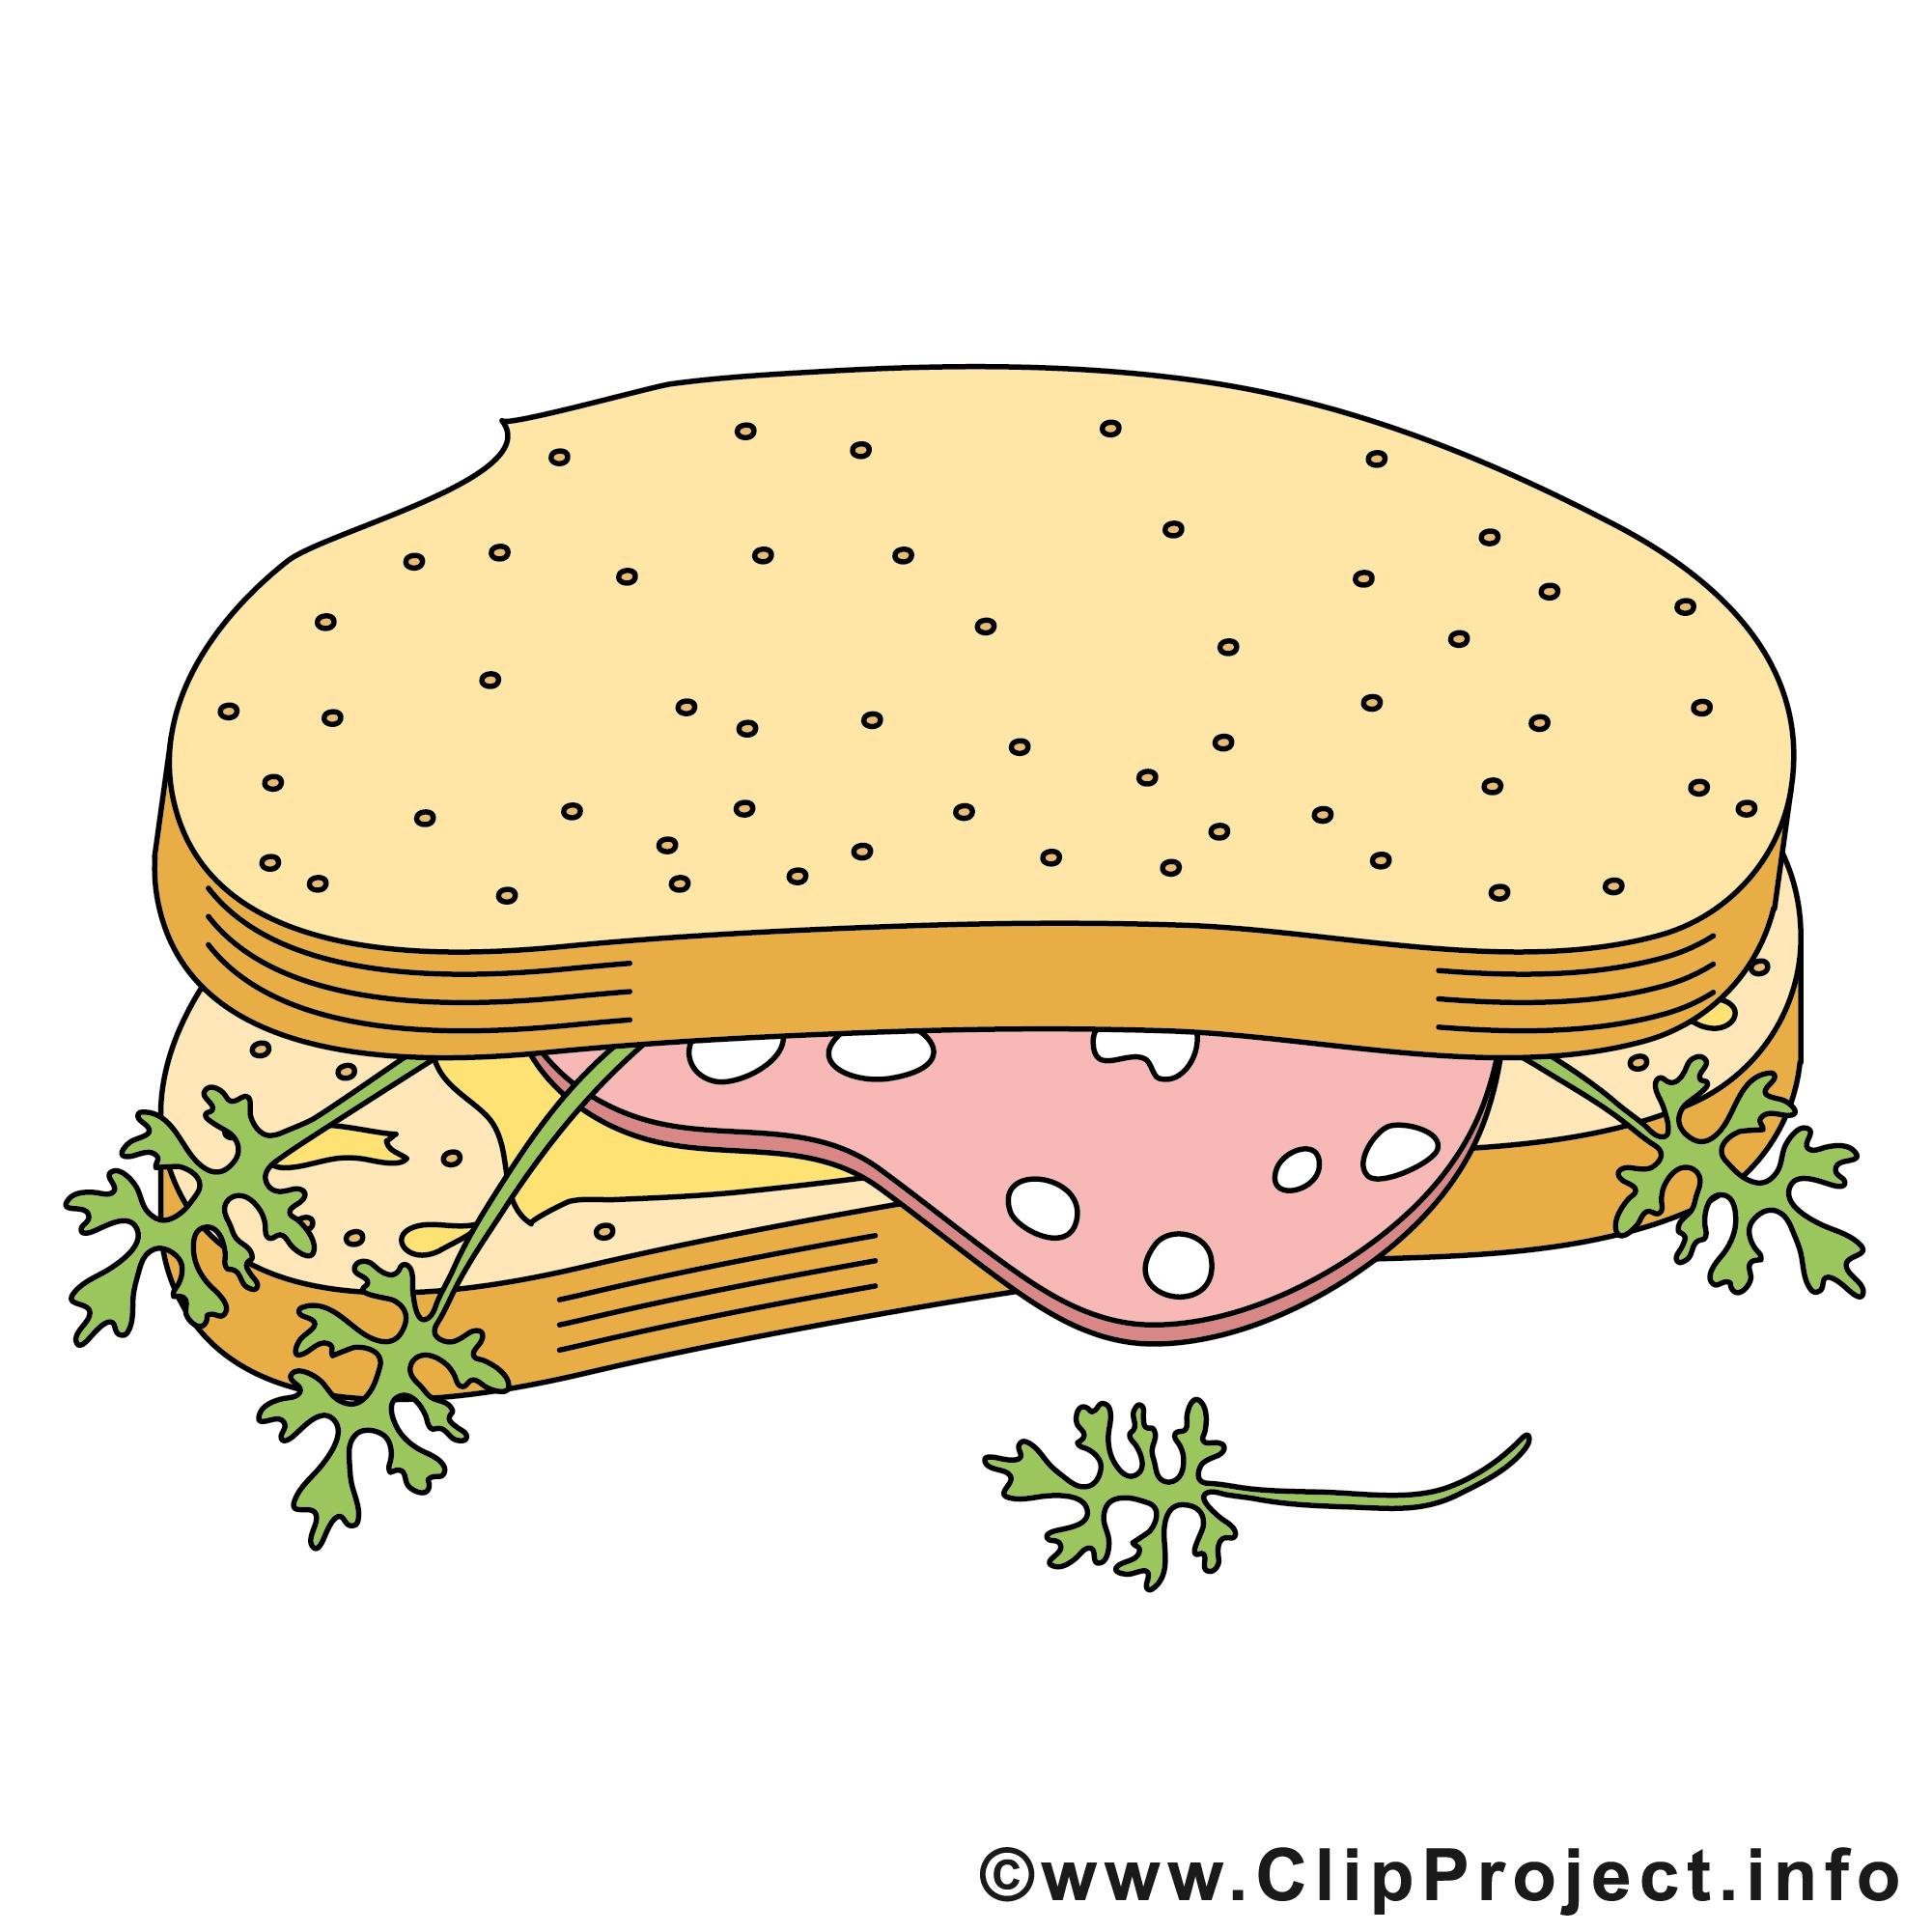 clipart gratuit nourriture - photo #8